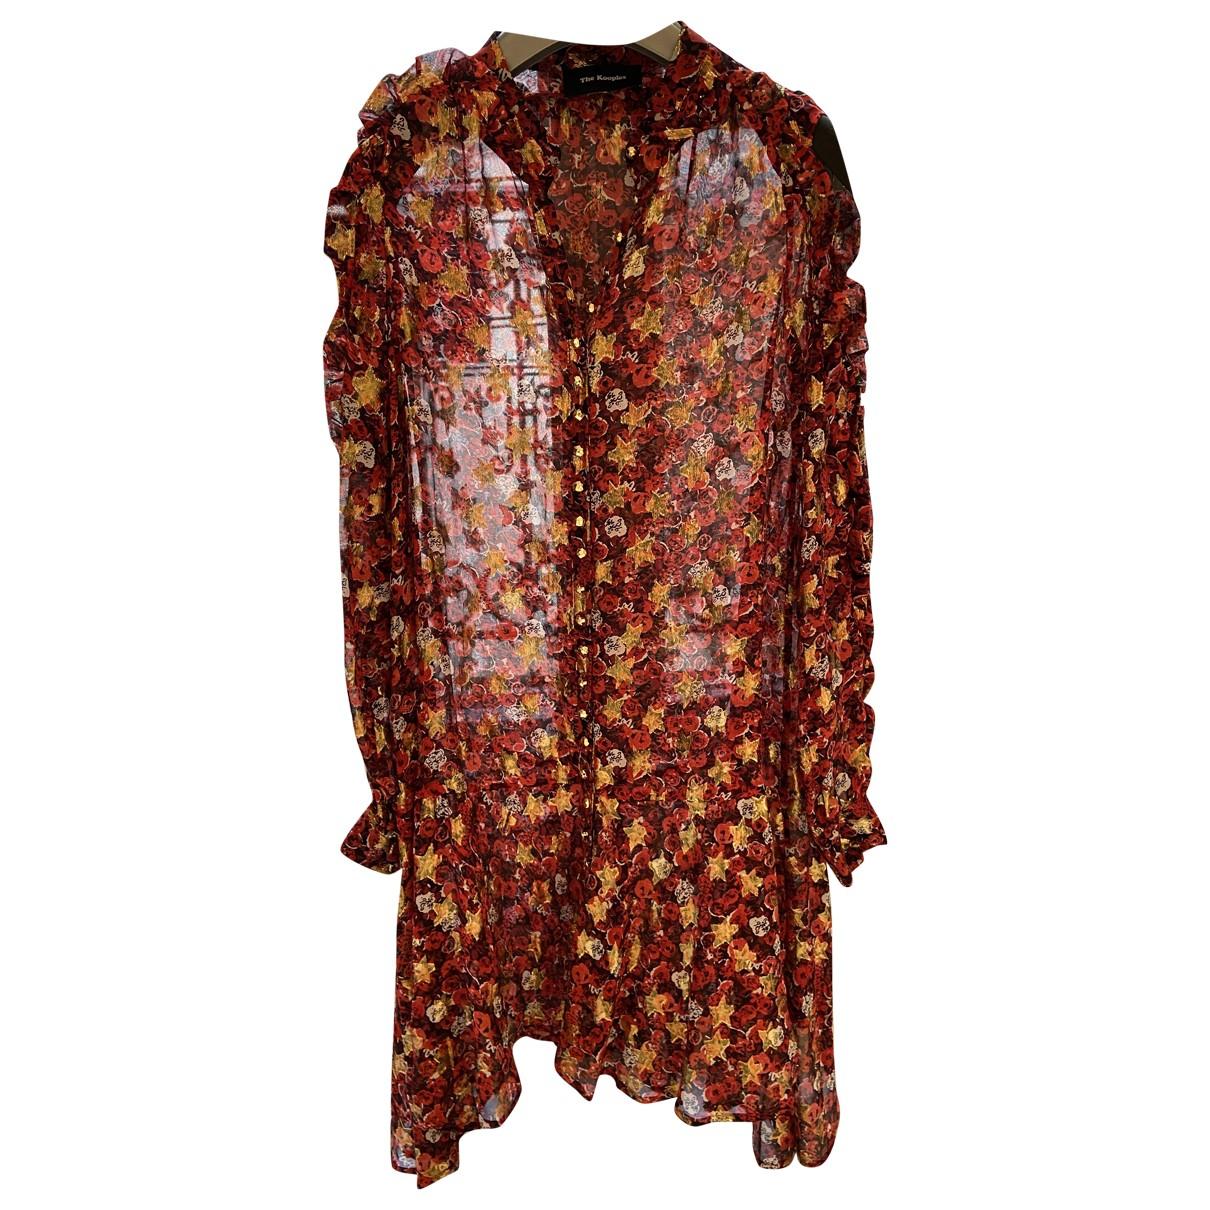 The Kooples Fall Winter 2019 Red Silk dress for Women 36 FR